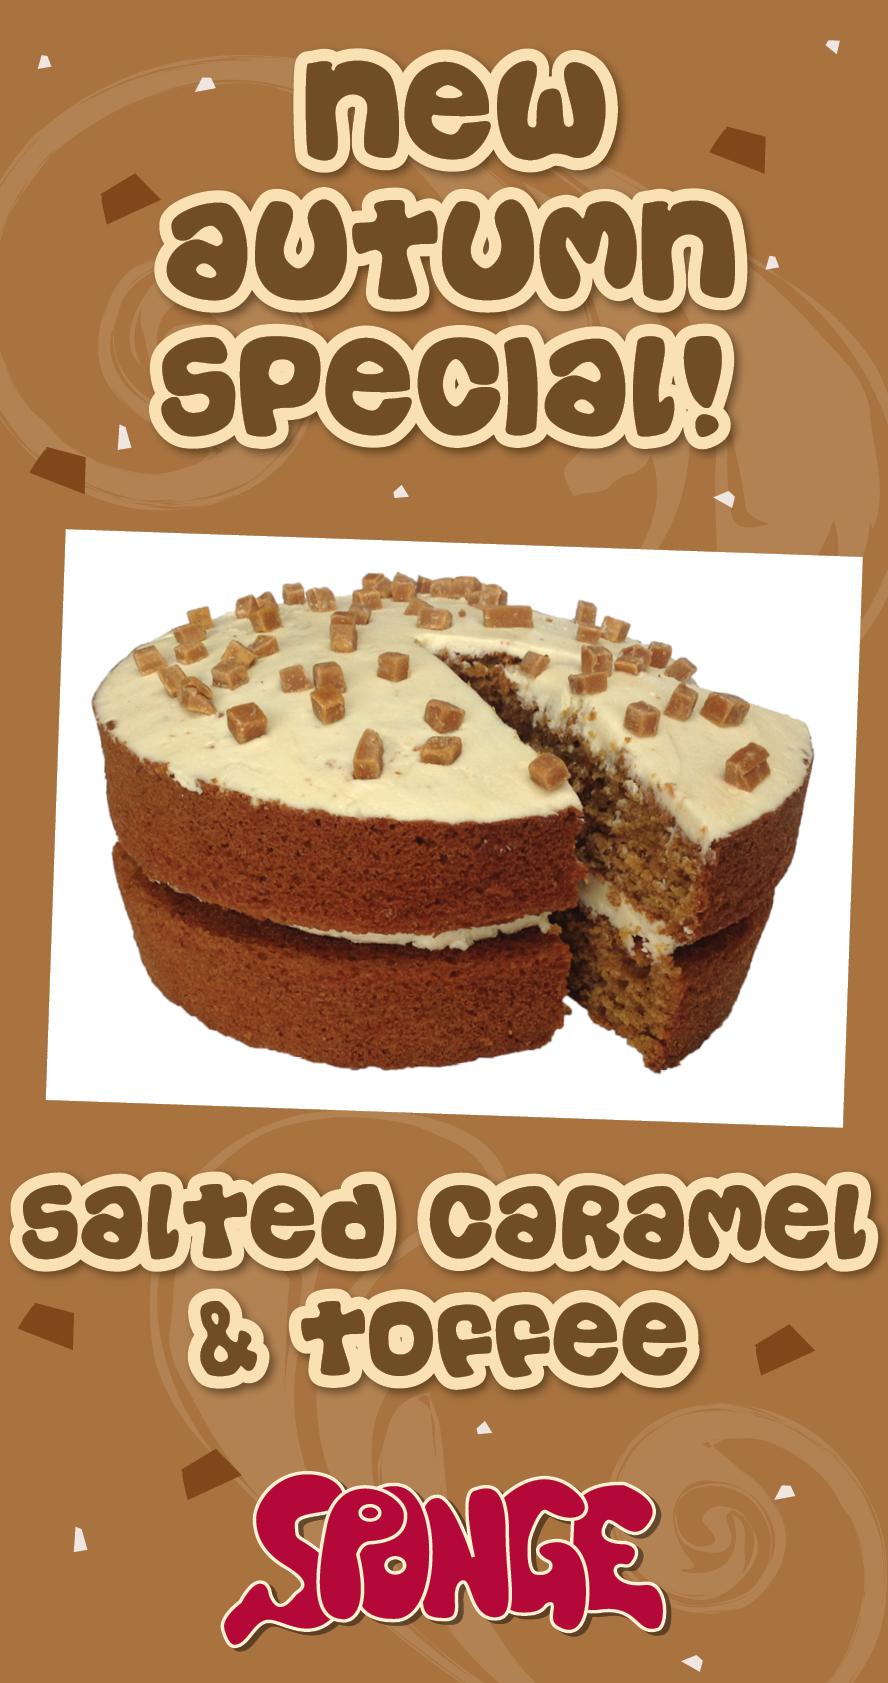 SPONGE Sponge Cakes Cake Delivery Bakers Birthday